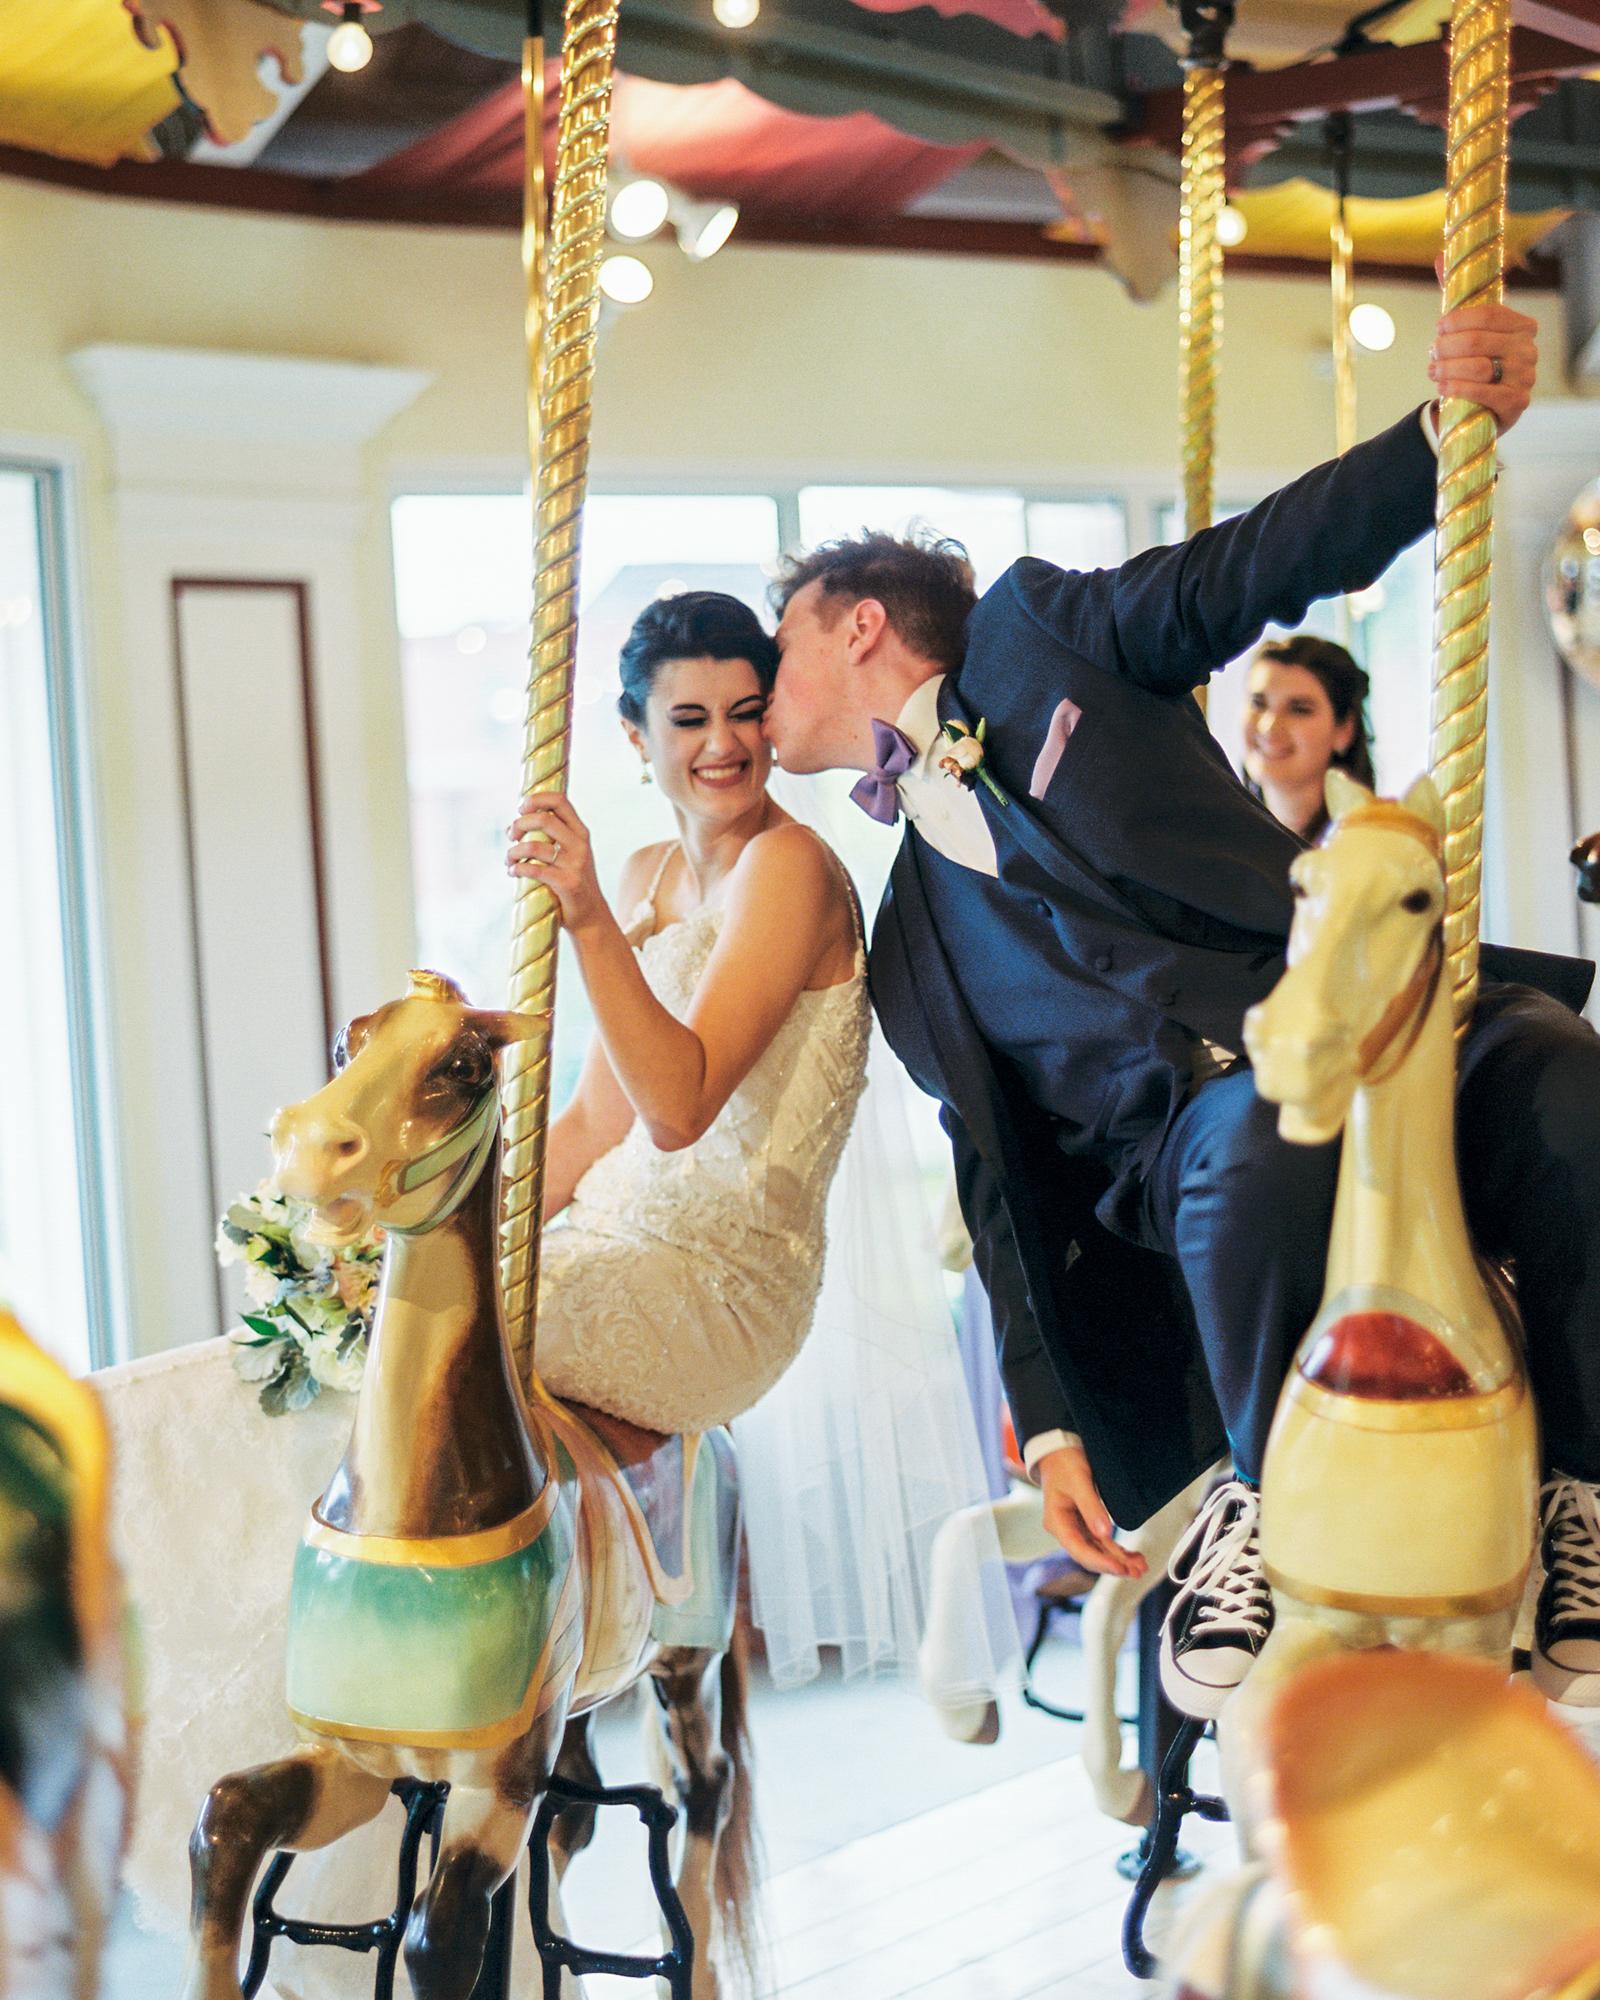 saratoga-springs-national-dance-eclectic-downtown-charlotte-film-wedding-photographer-carousel-9.jpg